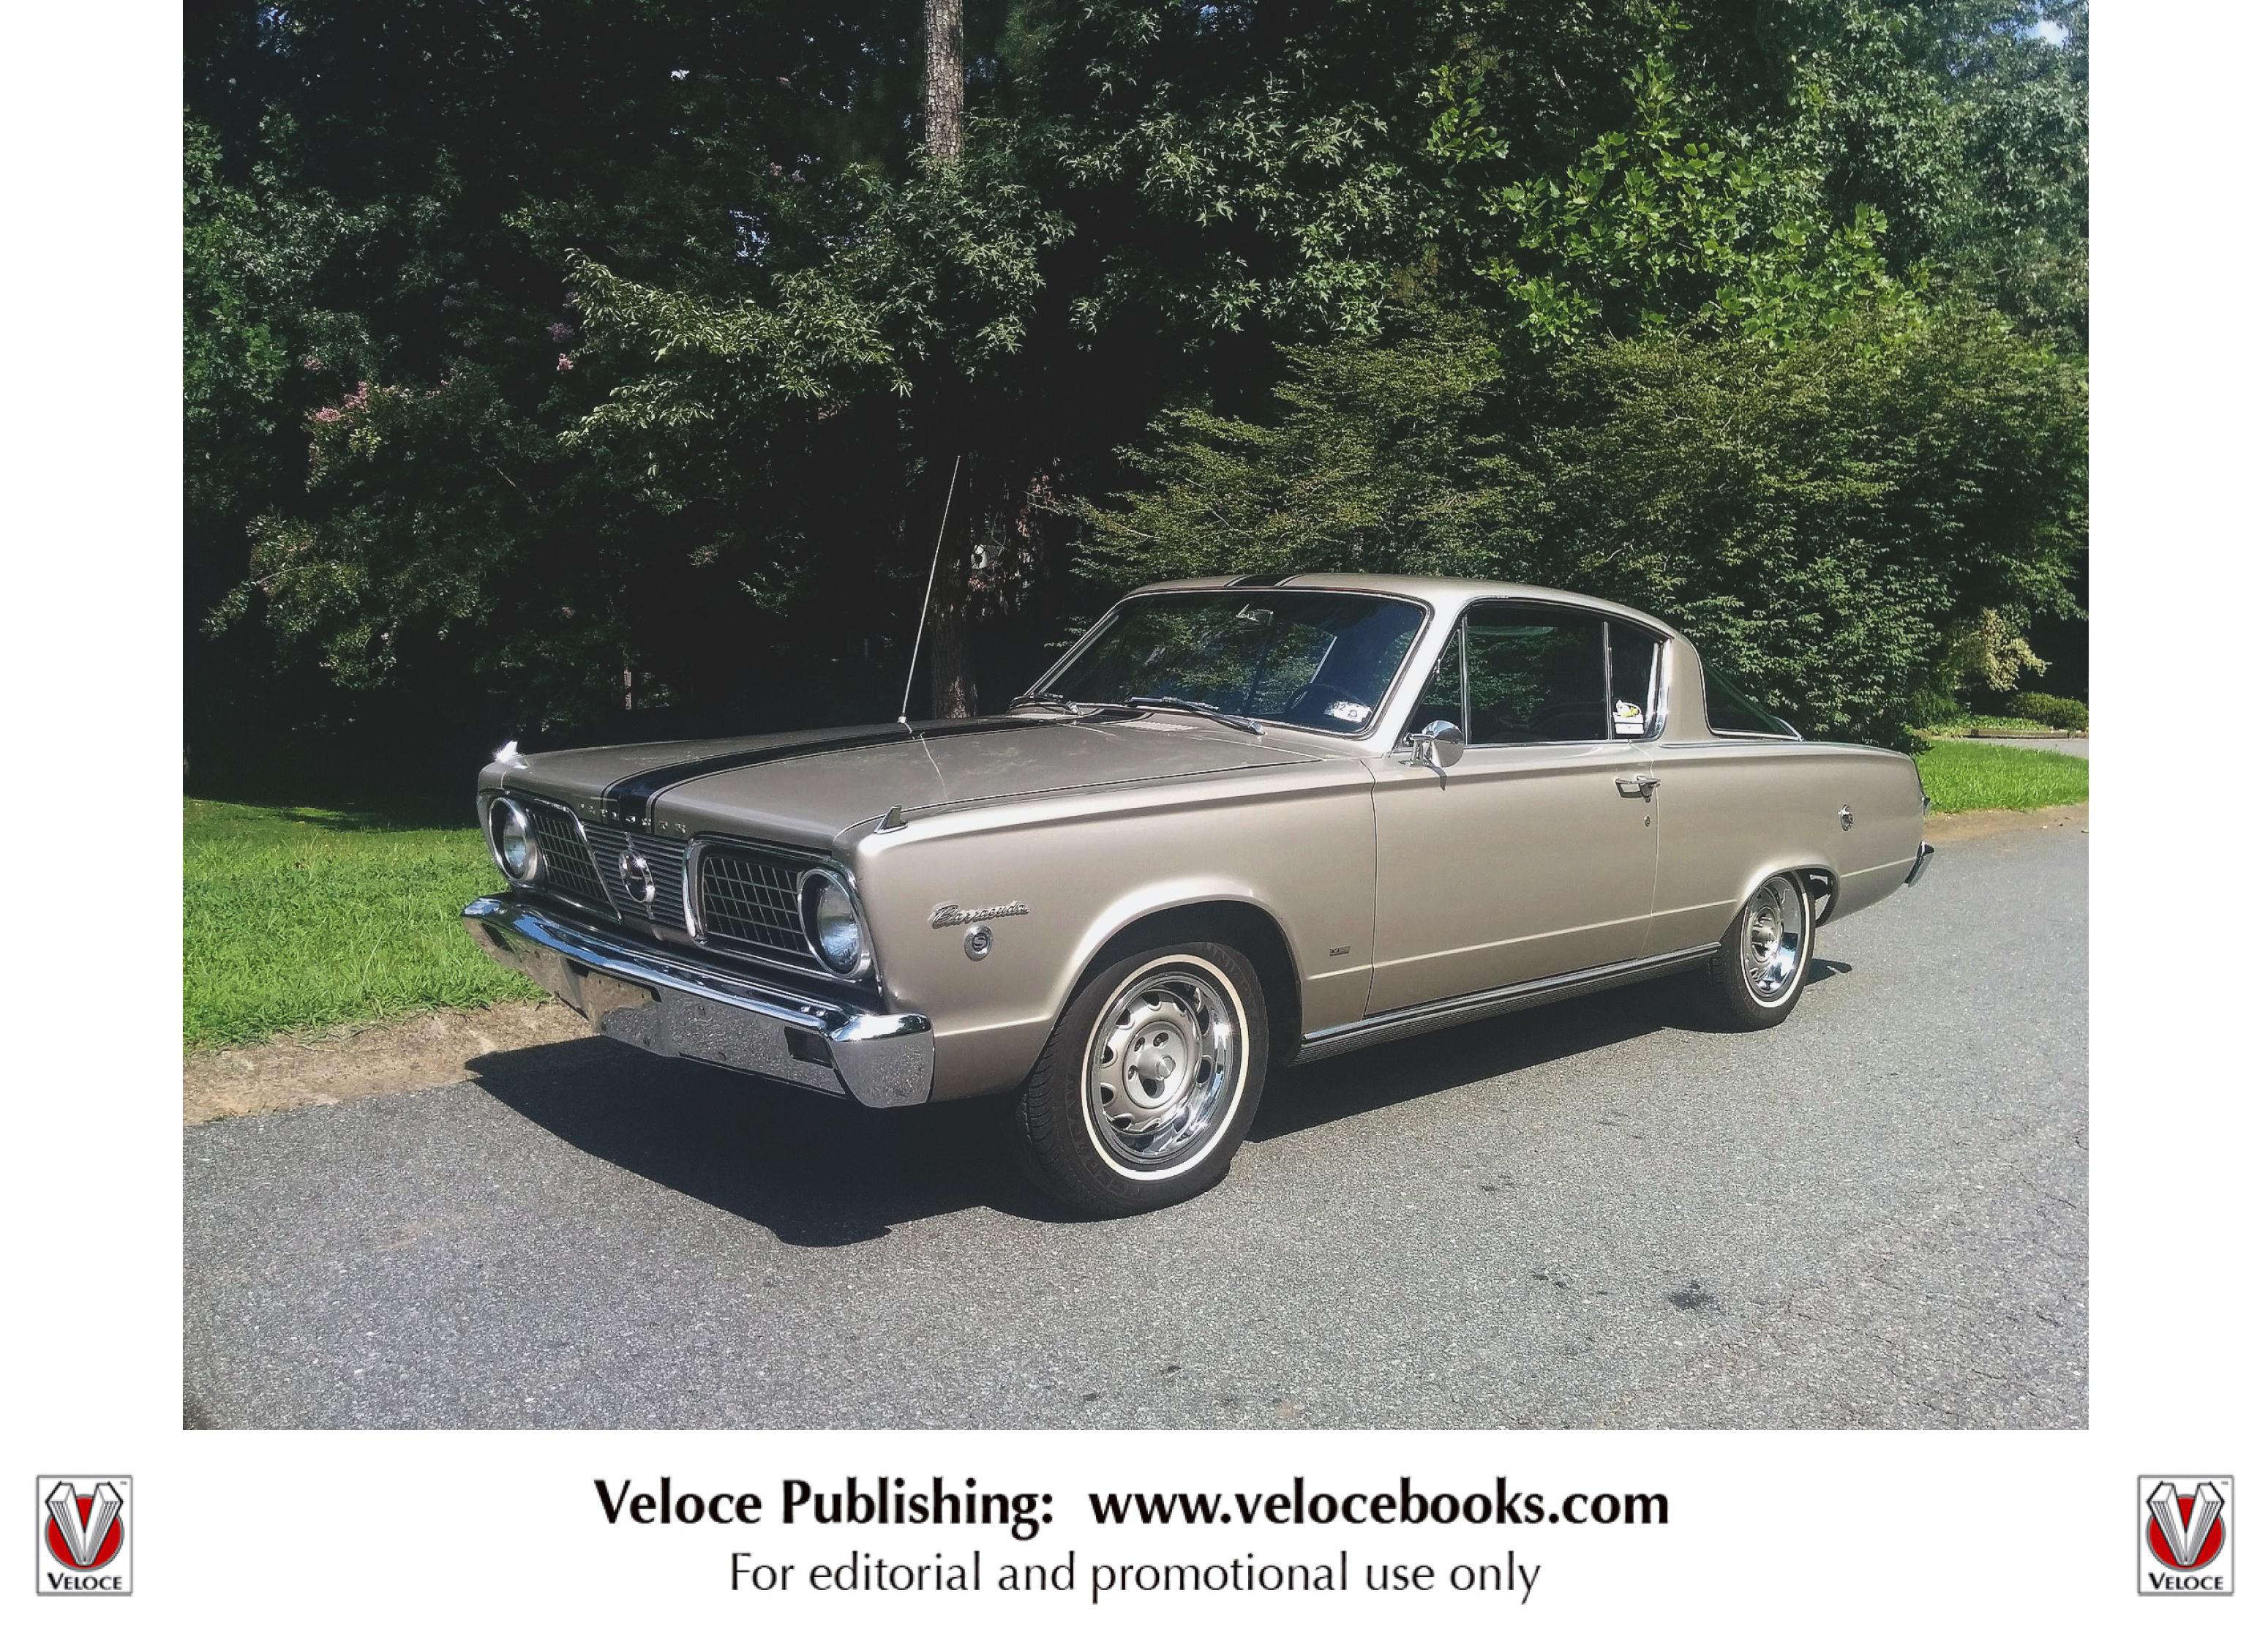 MOPAR Muscle - Barracuda, Dart & Valiant 1960-1980 by Marc Cranswick